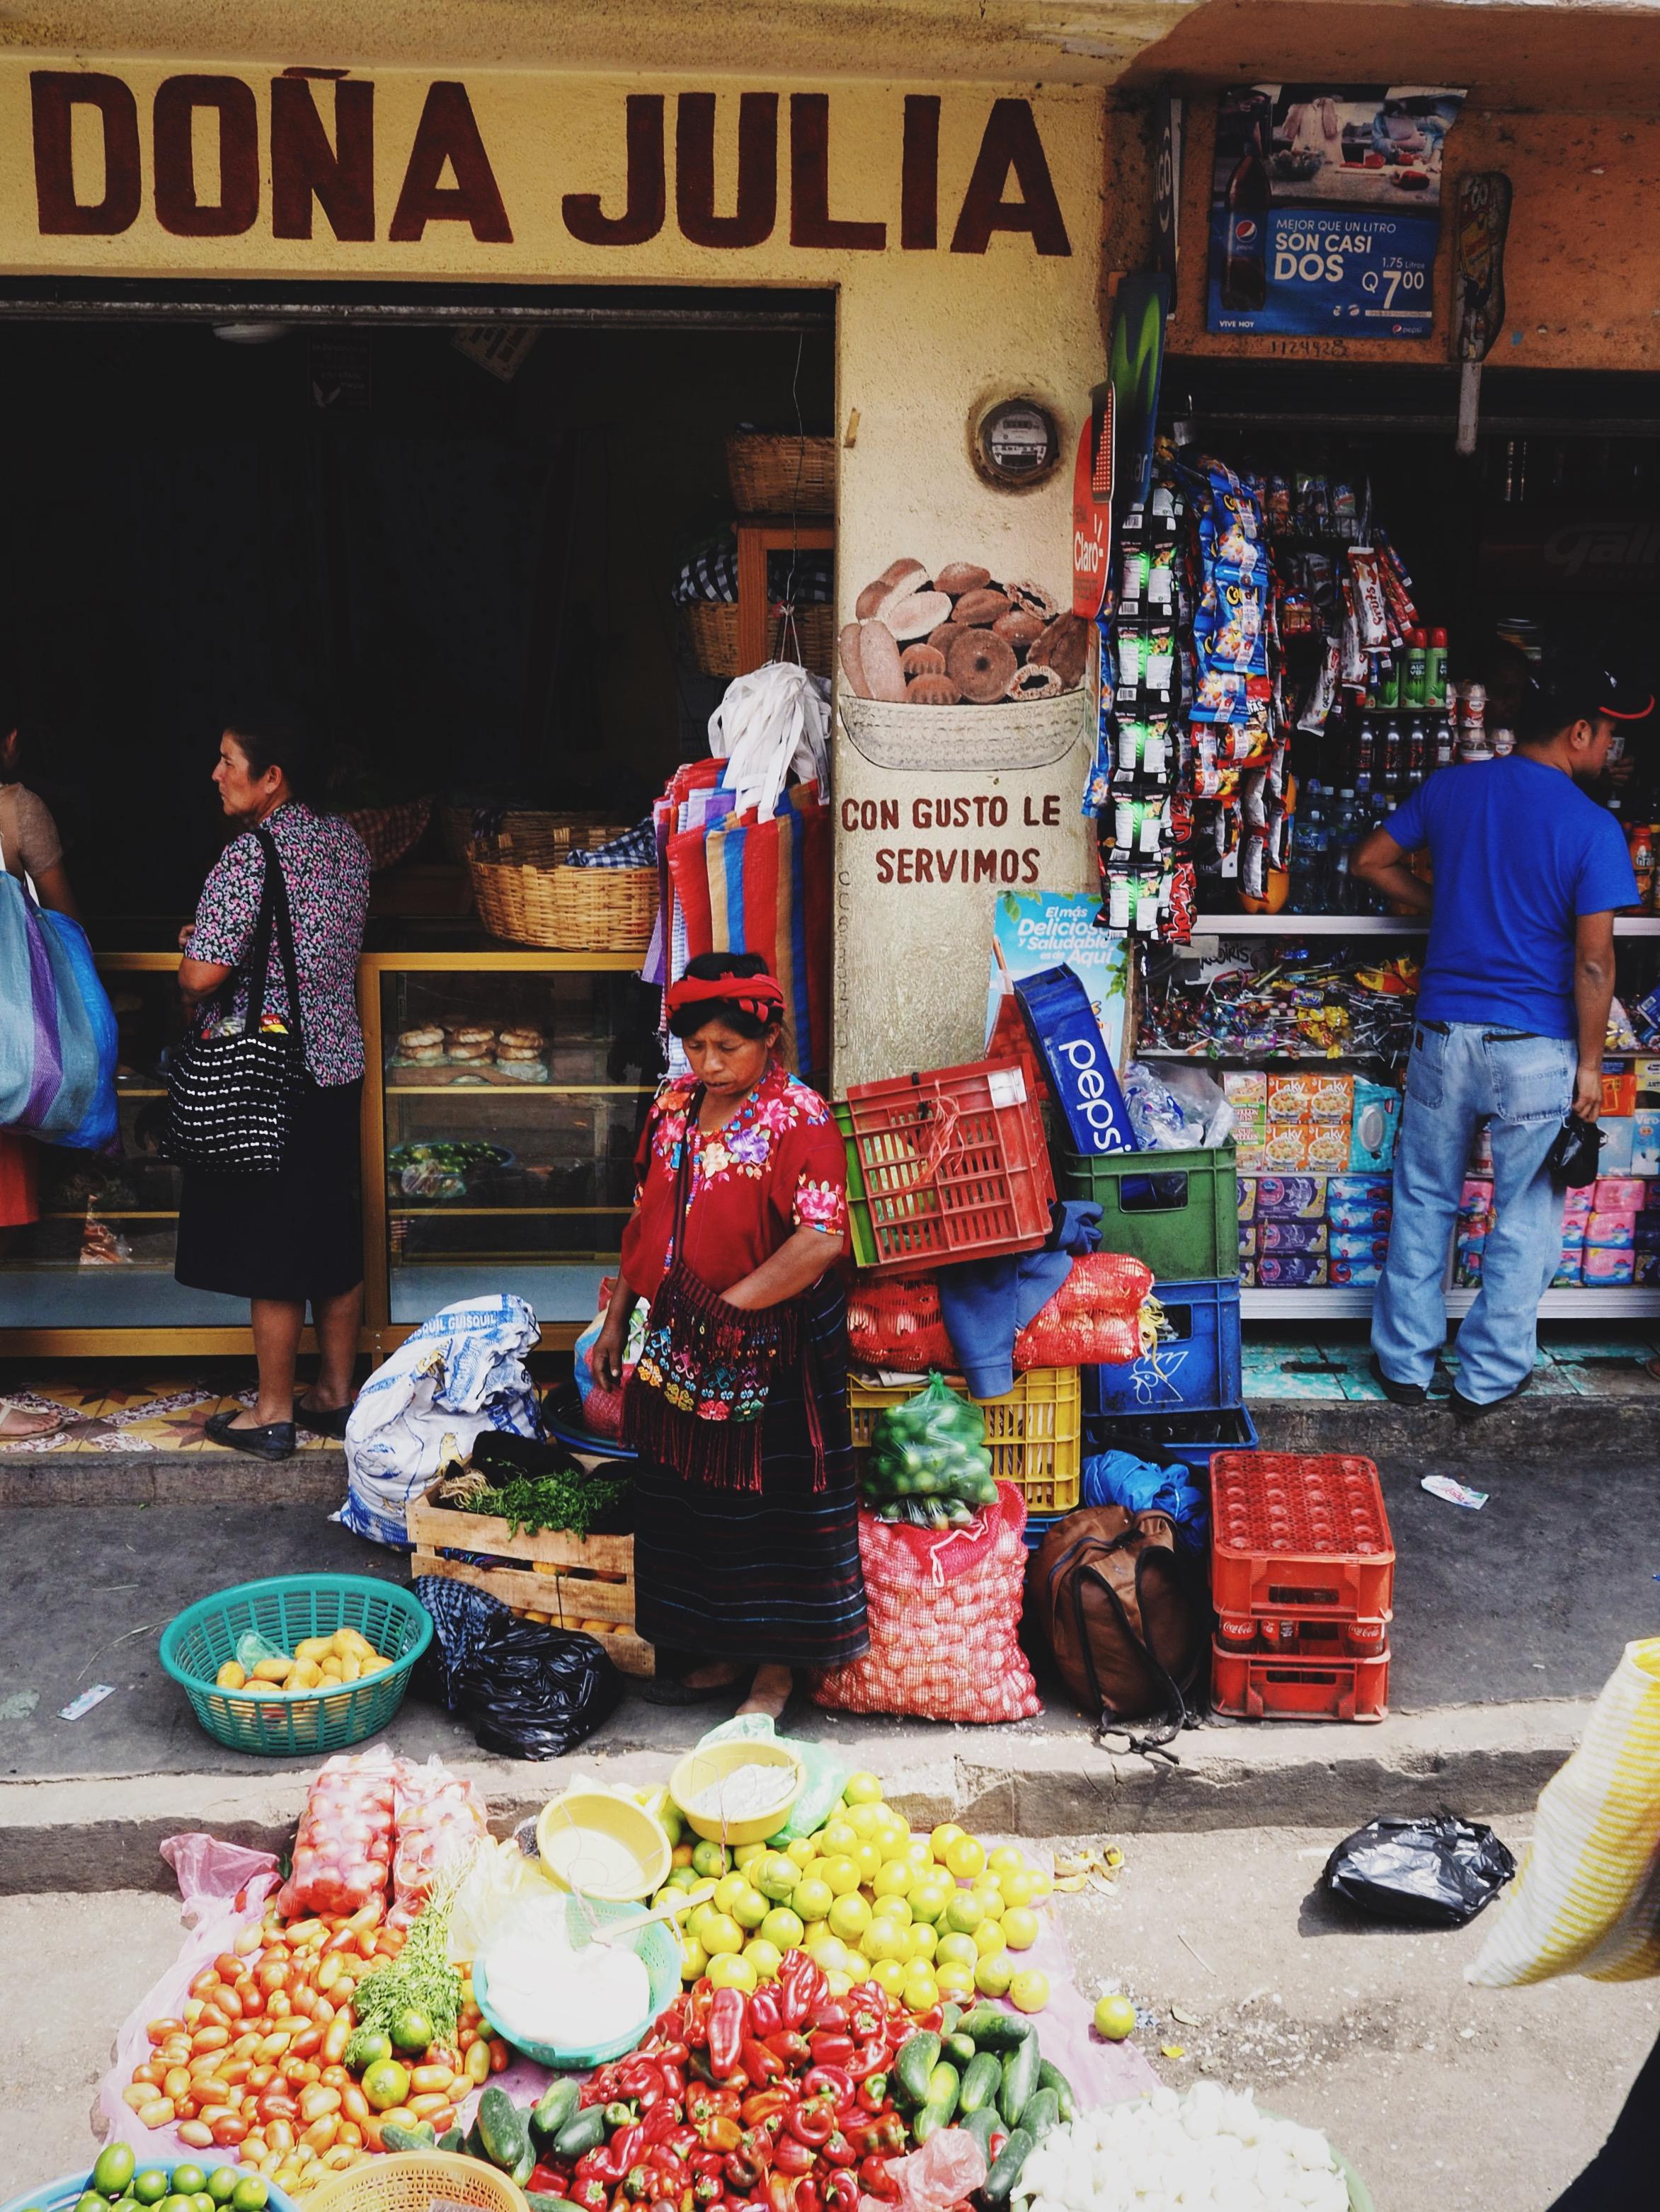 Mayan woman selling produce, Huehuetenango